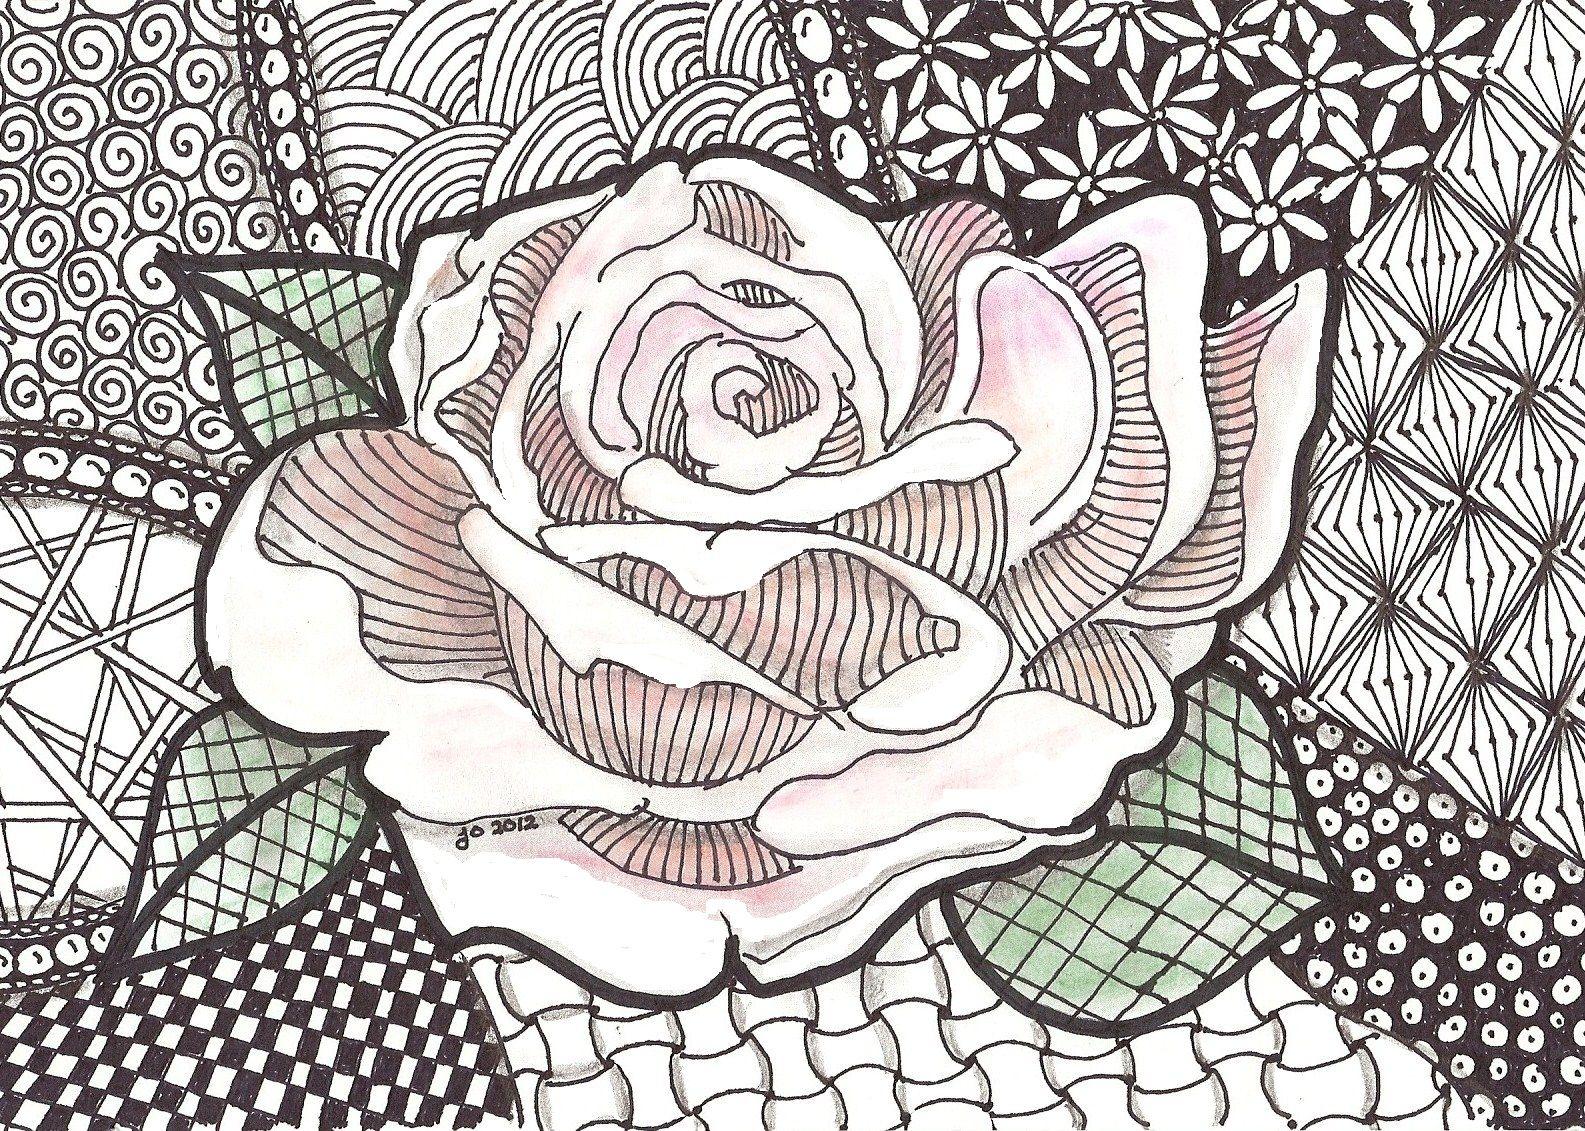 Rose Zentangle In Process Zentangle Mandalas Ink Drawings 3